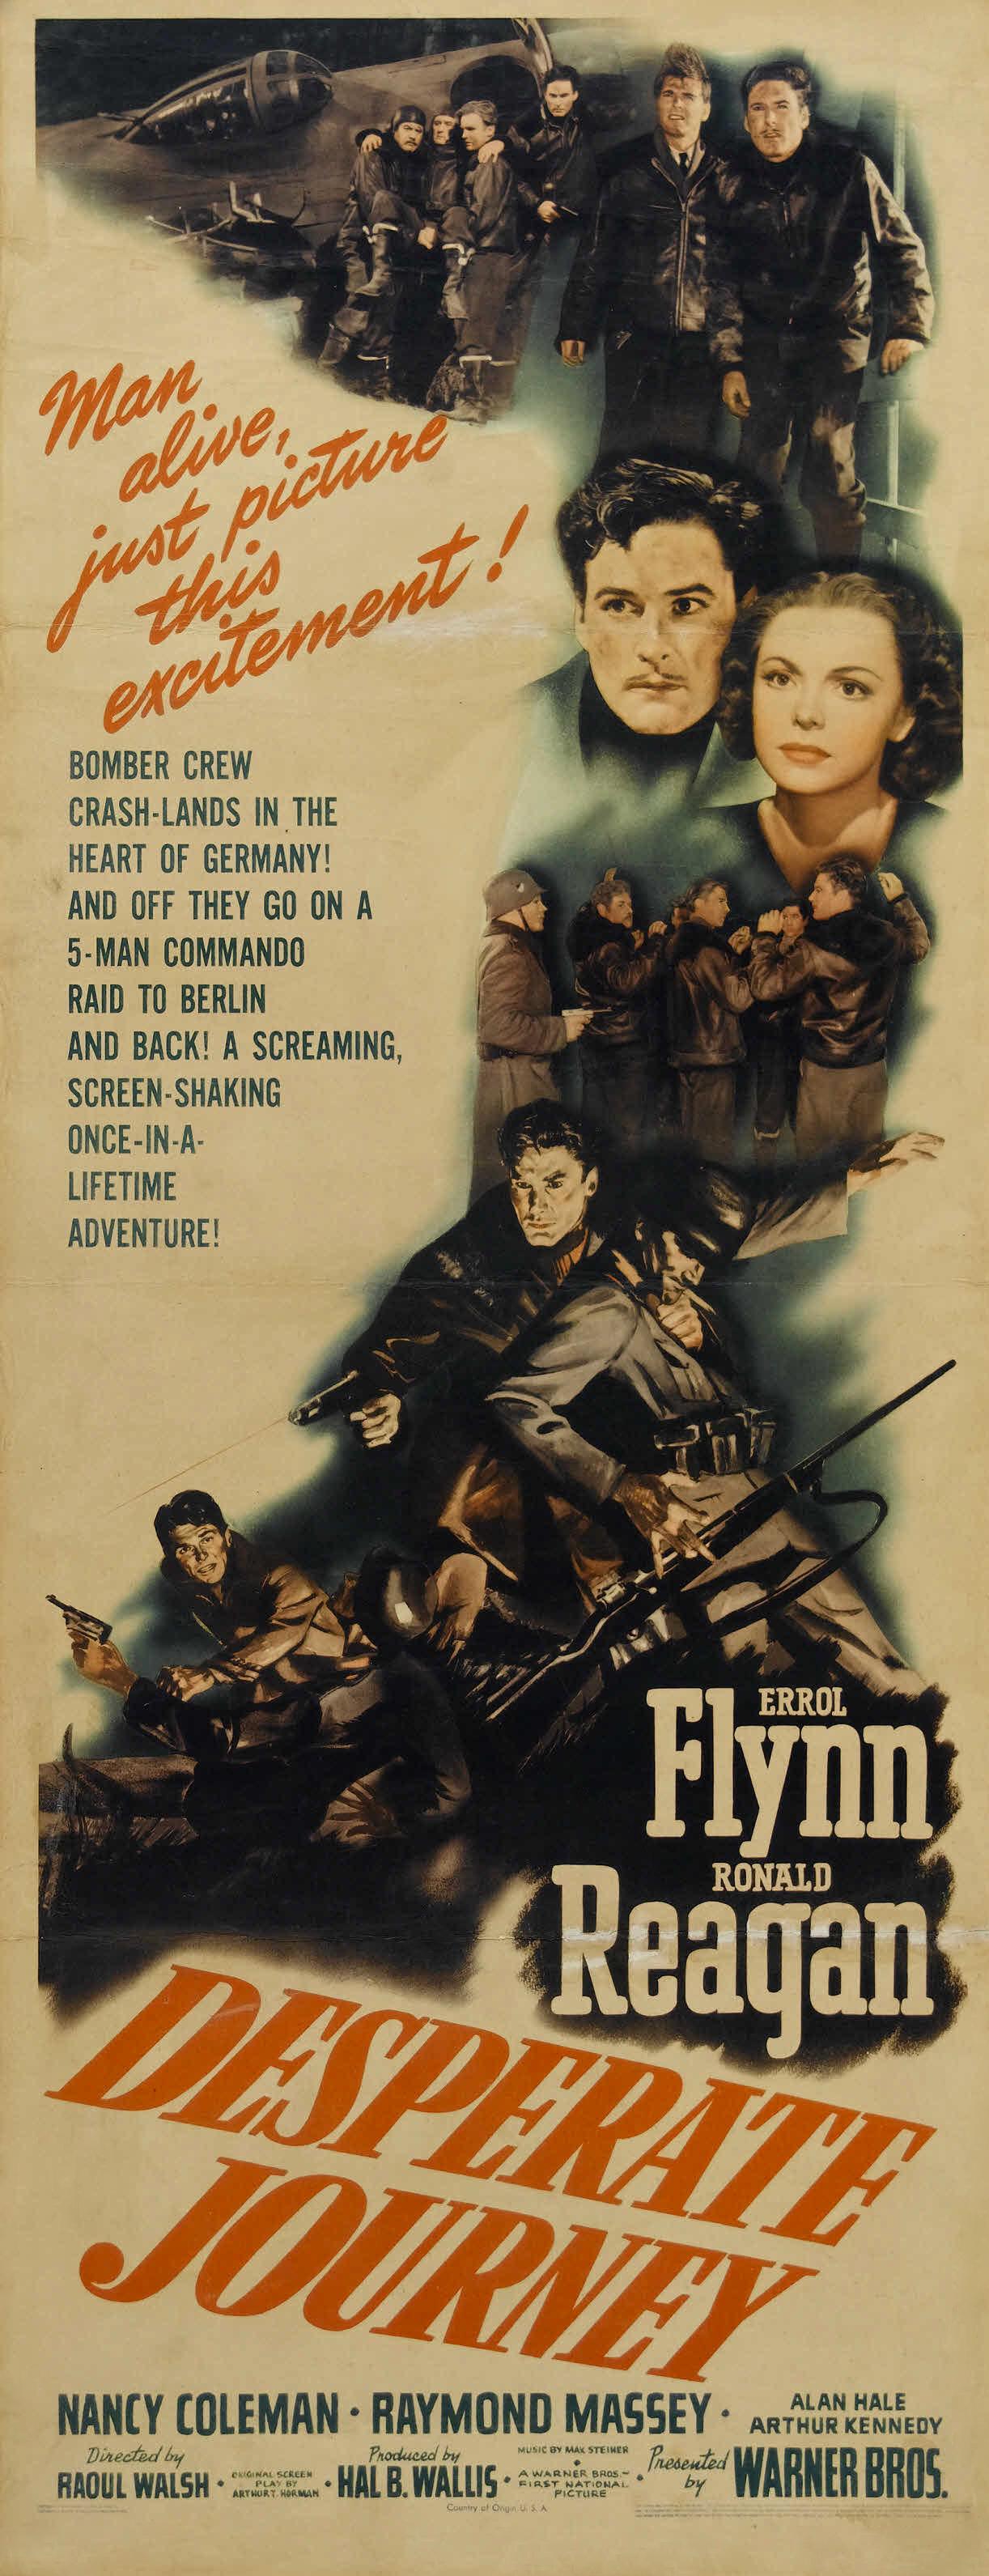 Errol Flynn, Ronald Reagan, and Nancy Coleman in Desperate Journey (1942)